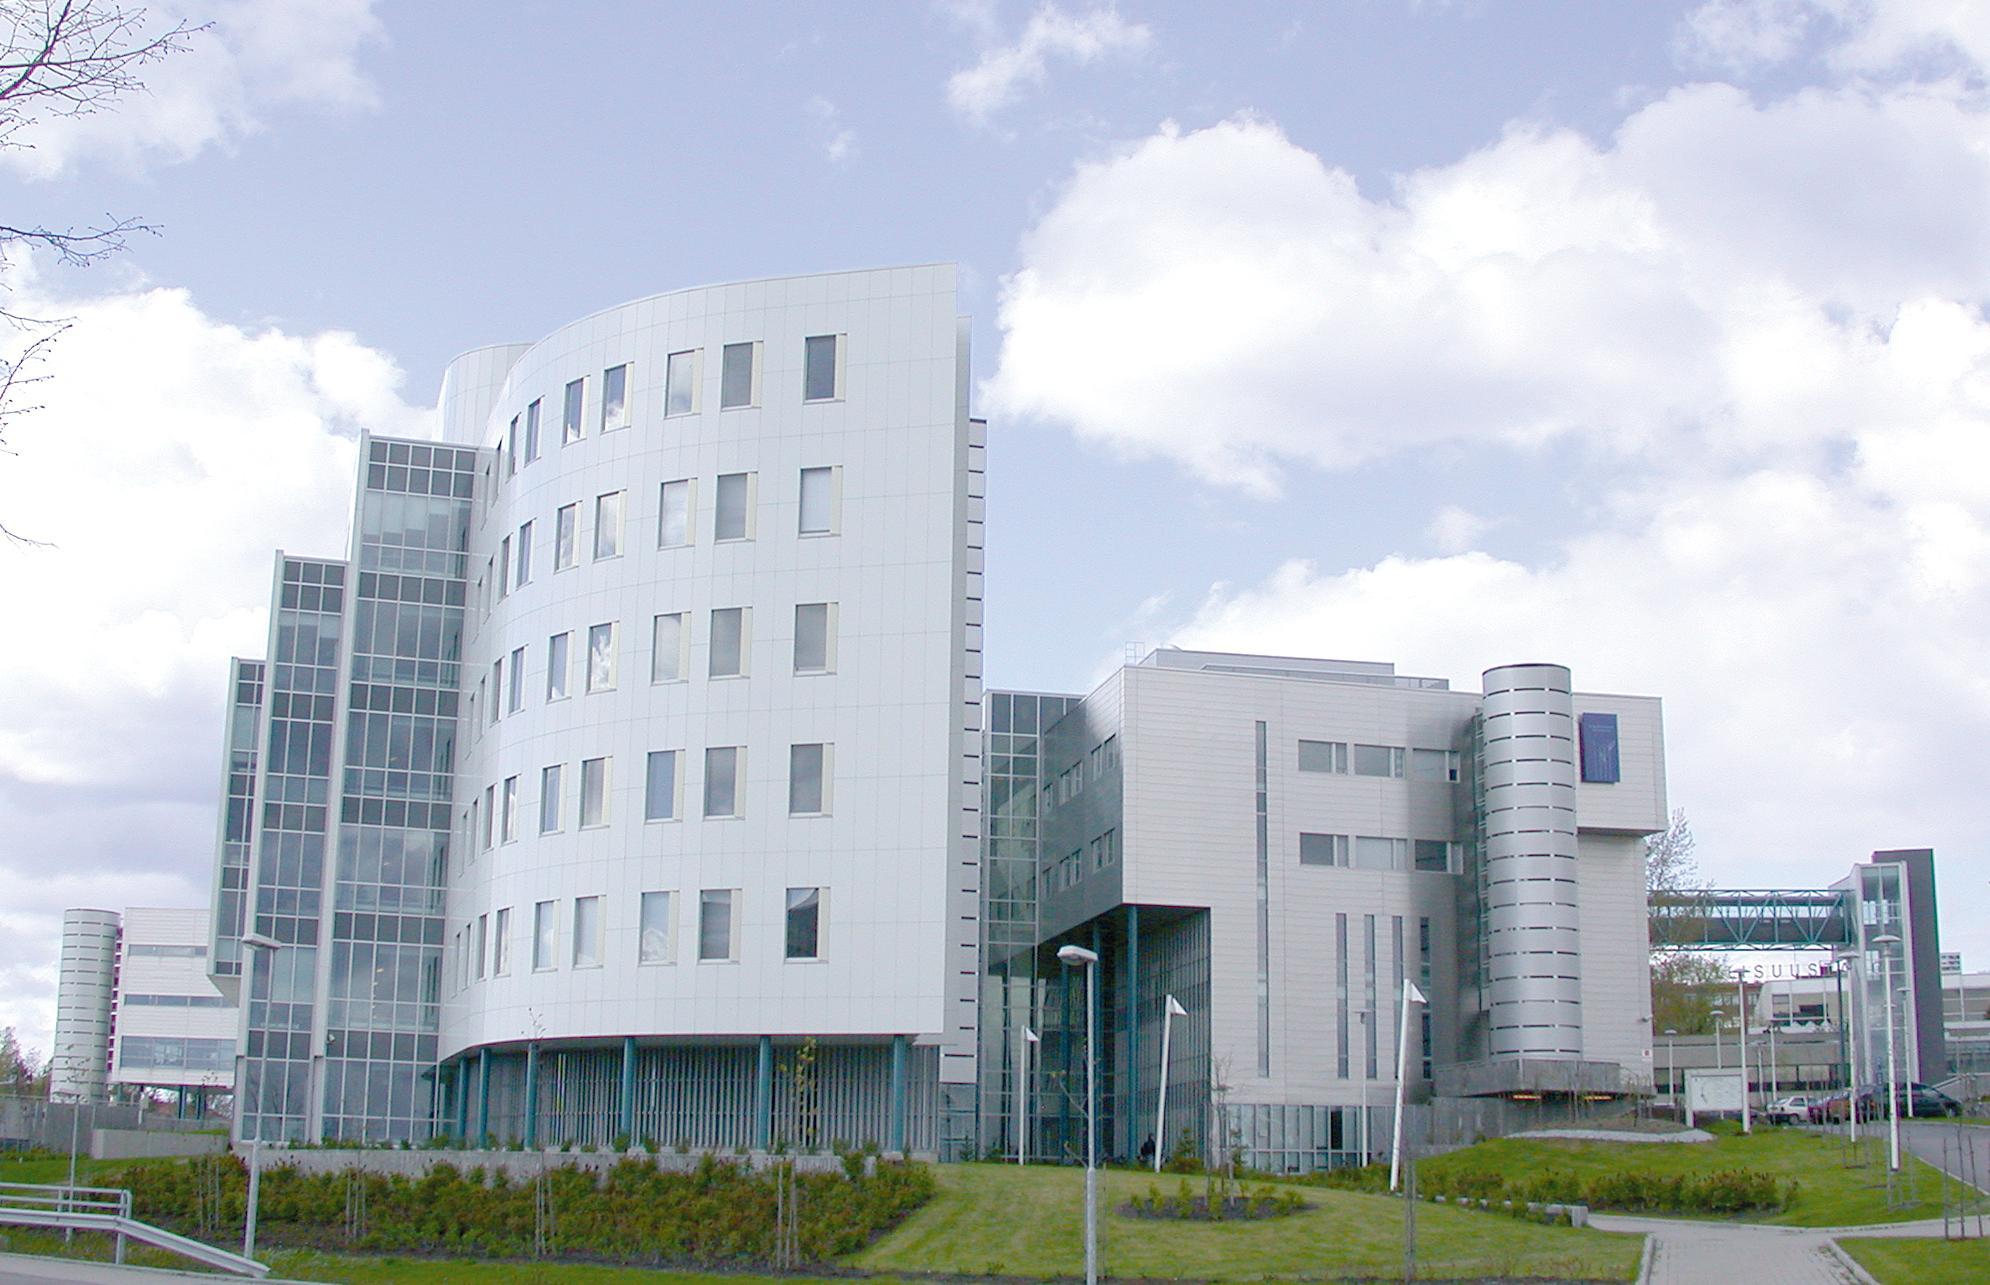 Yliopisto Tampere